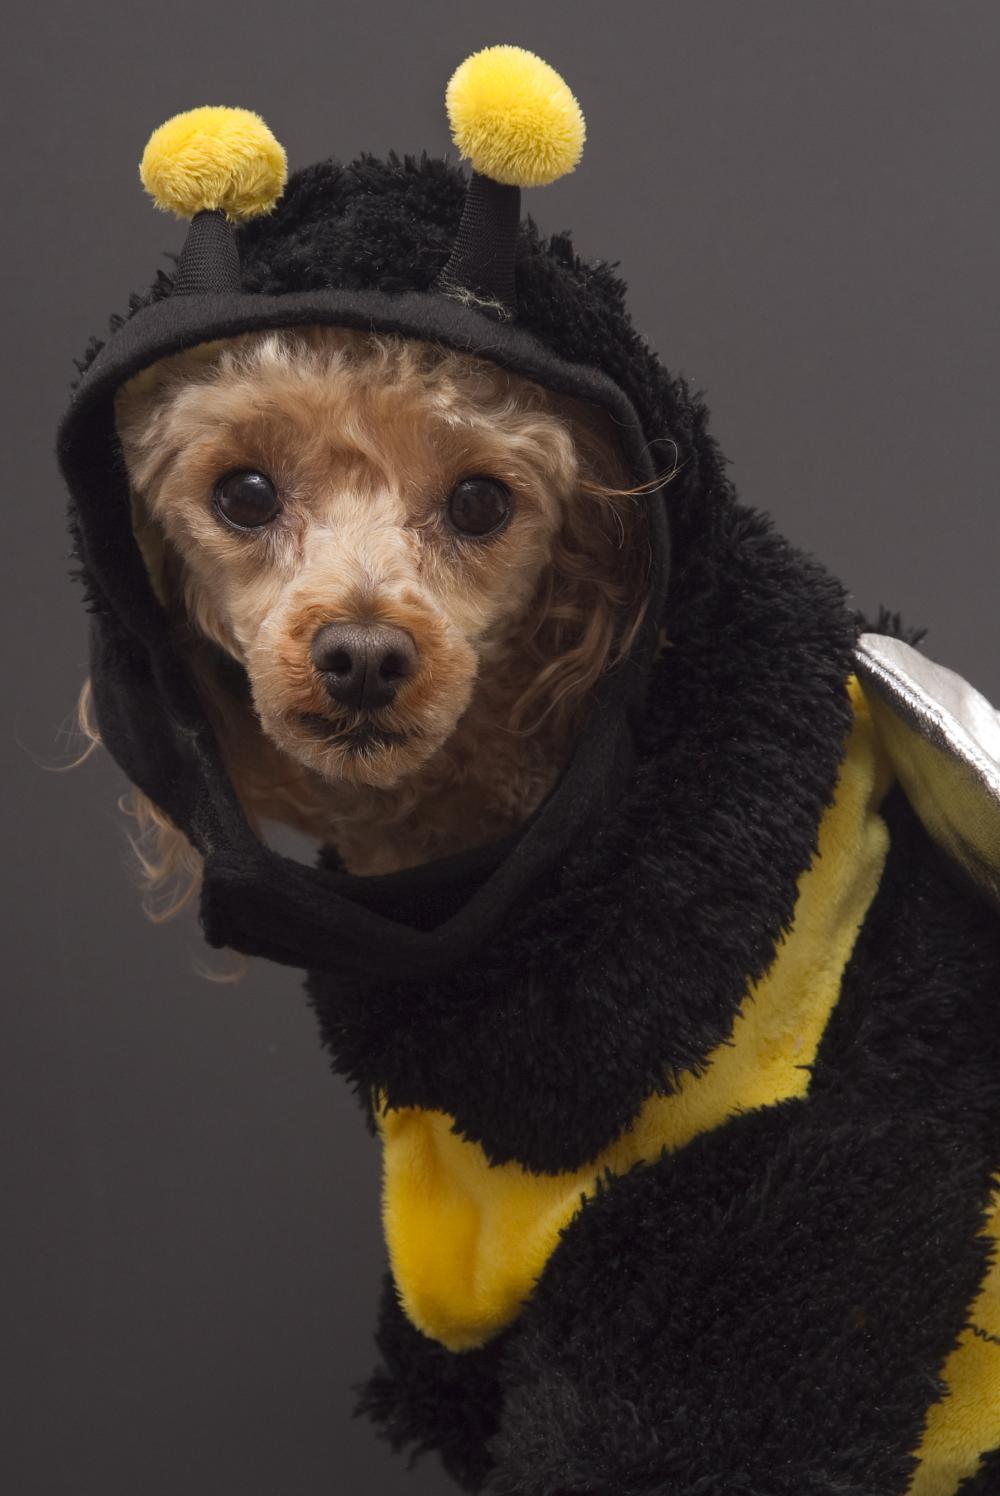 Bumblebee dog funny dog halloween costumes